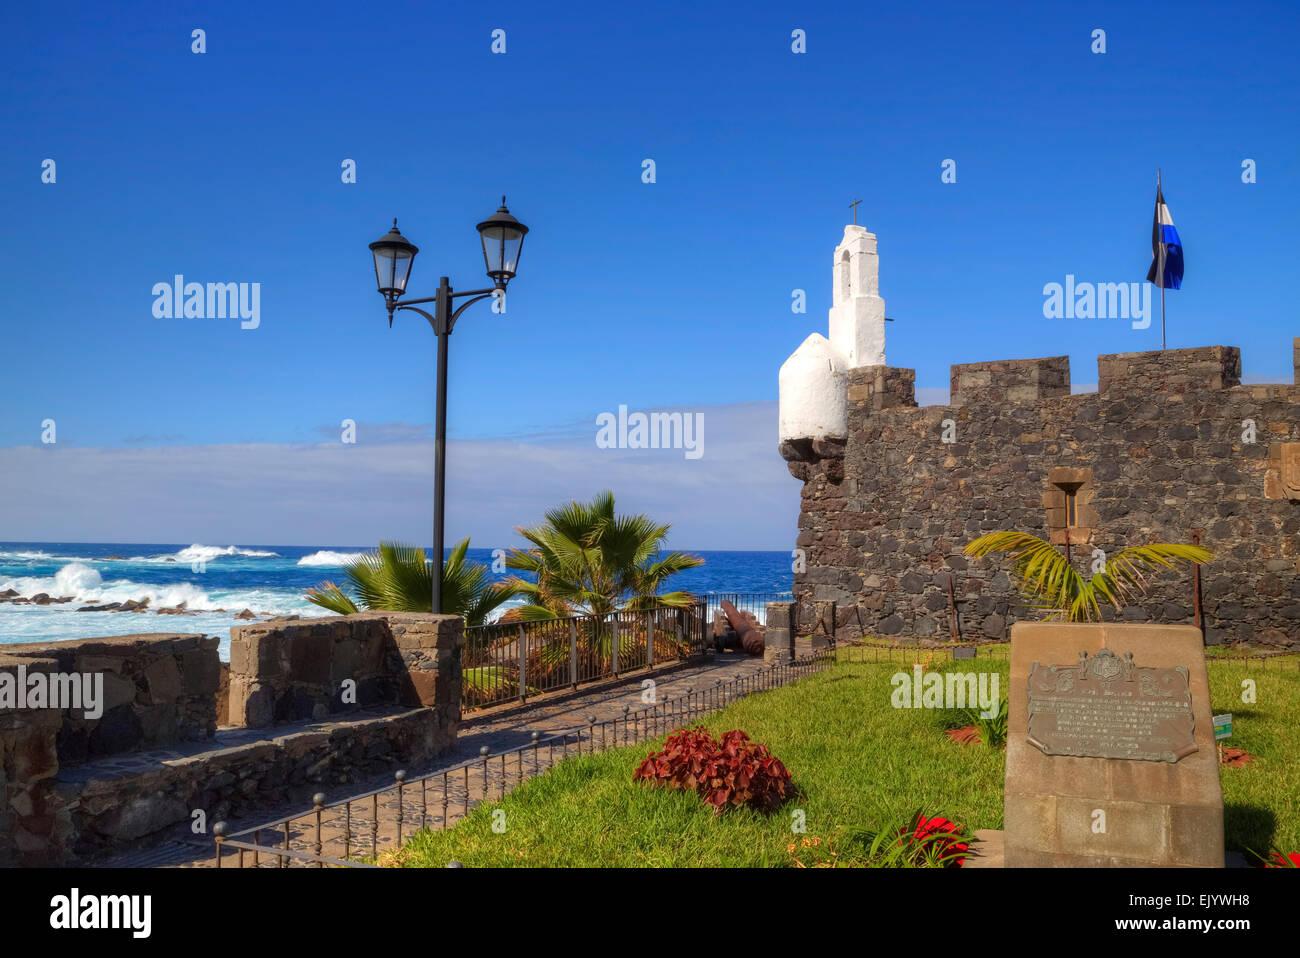 Garachico, Tenerife, Canary Islands, Spain - Stock Image